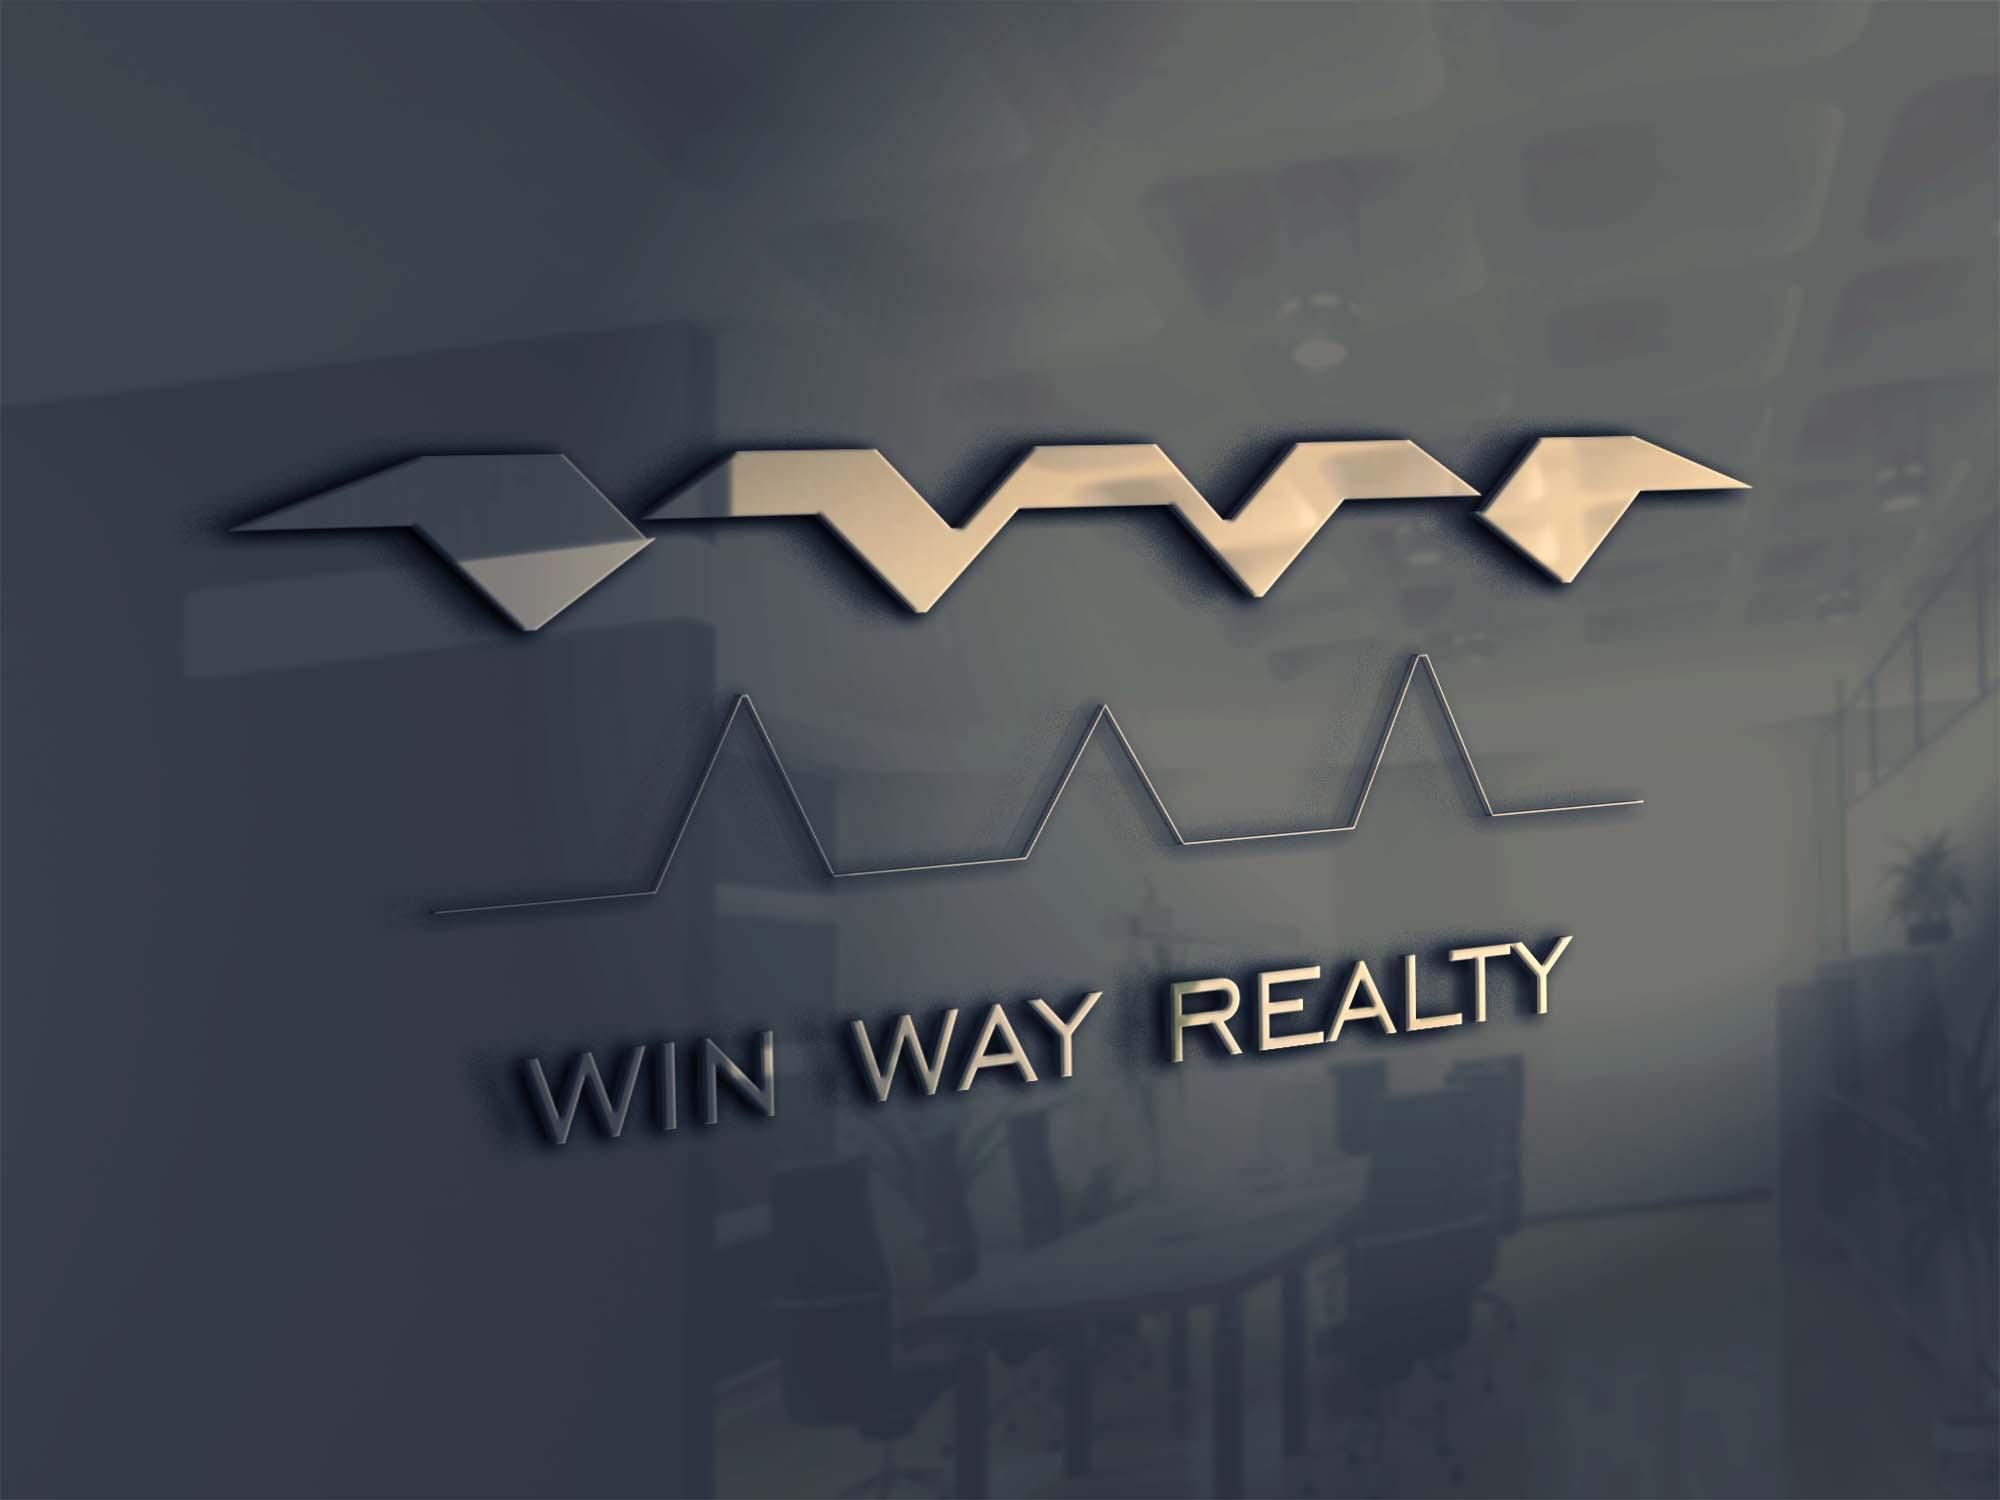 Логотип для агентства недвижимости фото f_7065aa99772e2db3.jpg